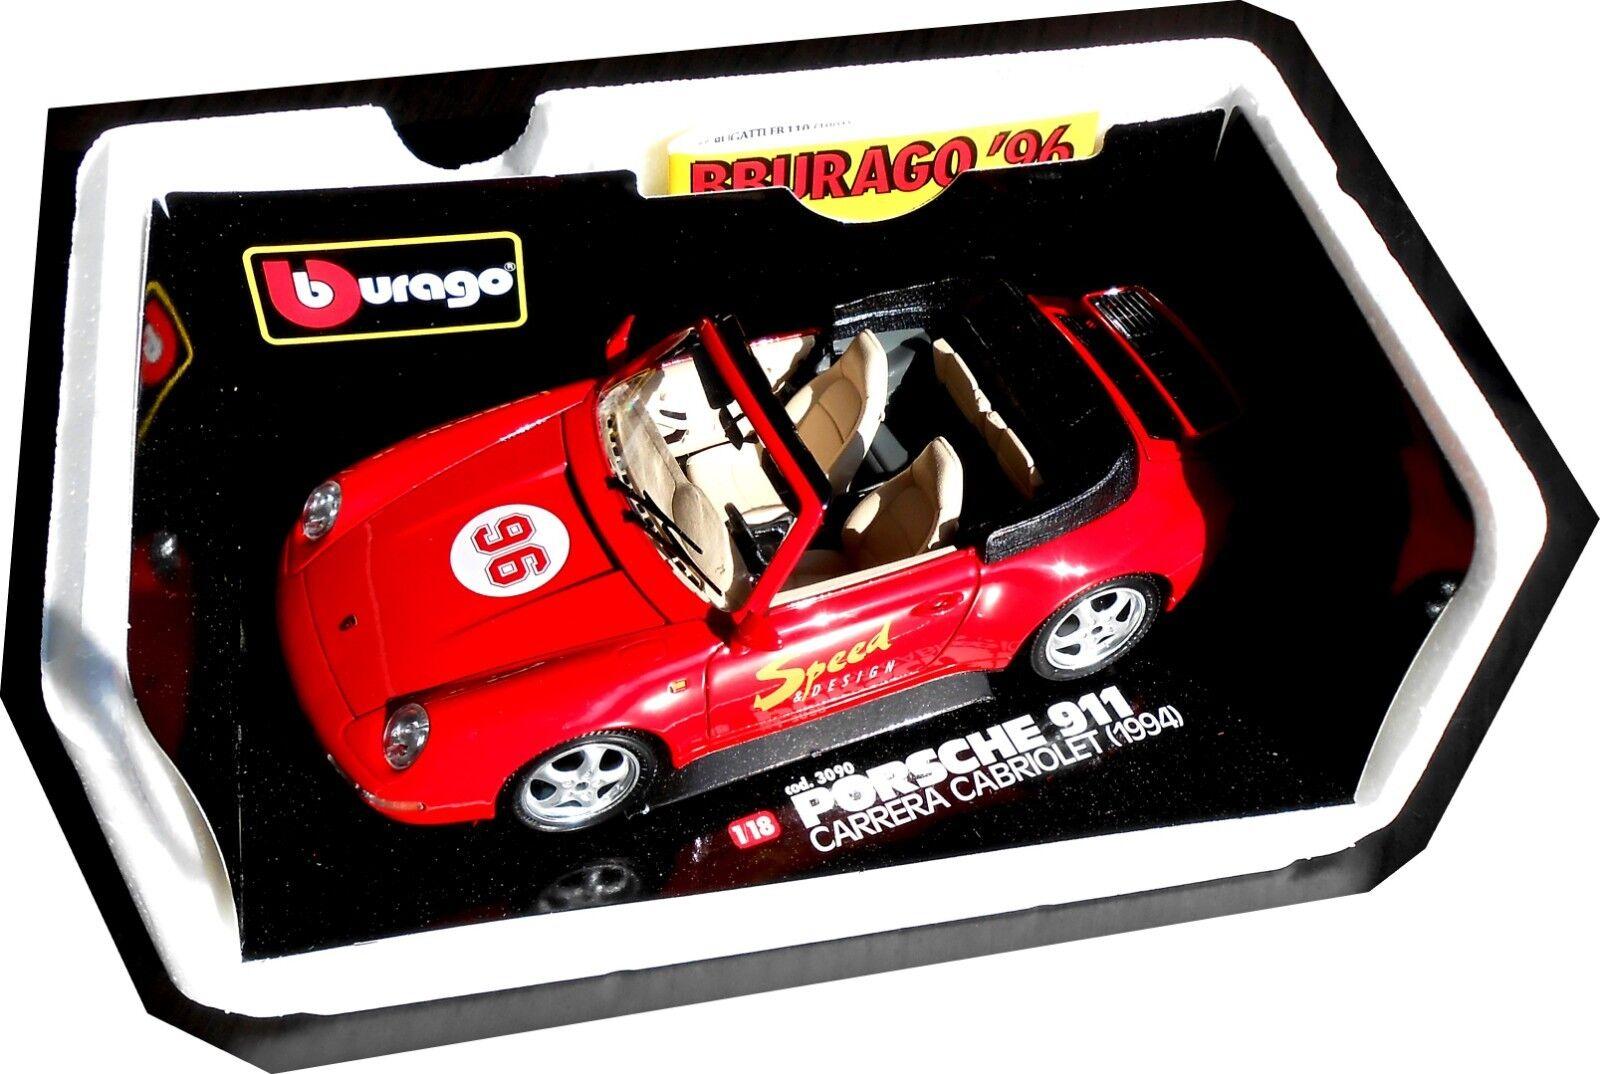 BBURAGO 3090 Porsche 993 Carrera Cabrio  Speed&Design ; 1 18, mb